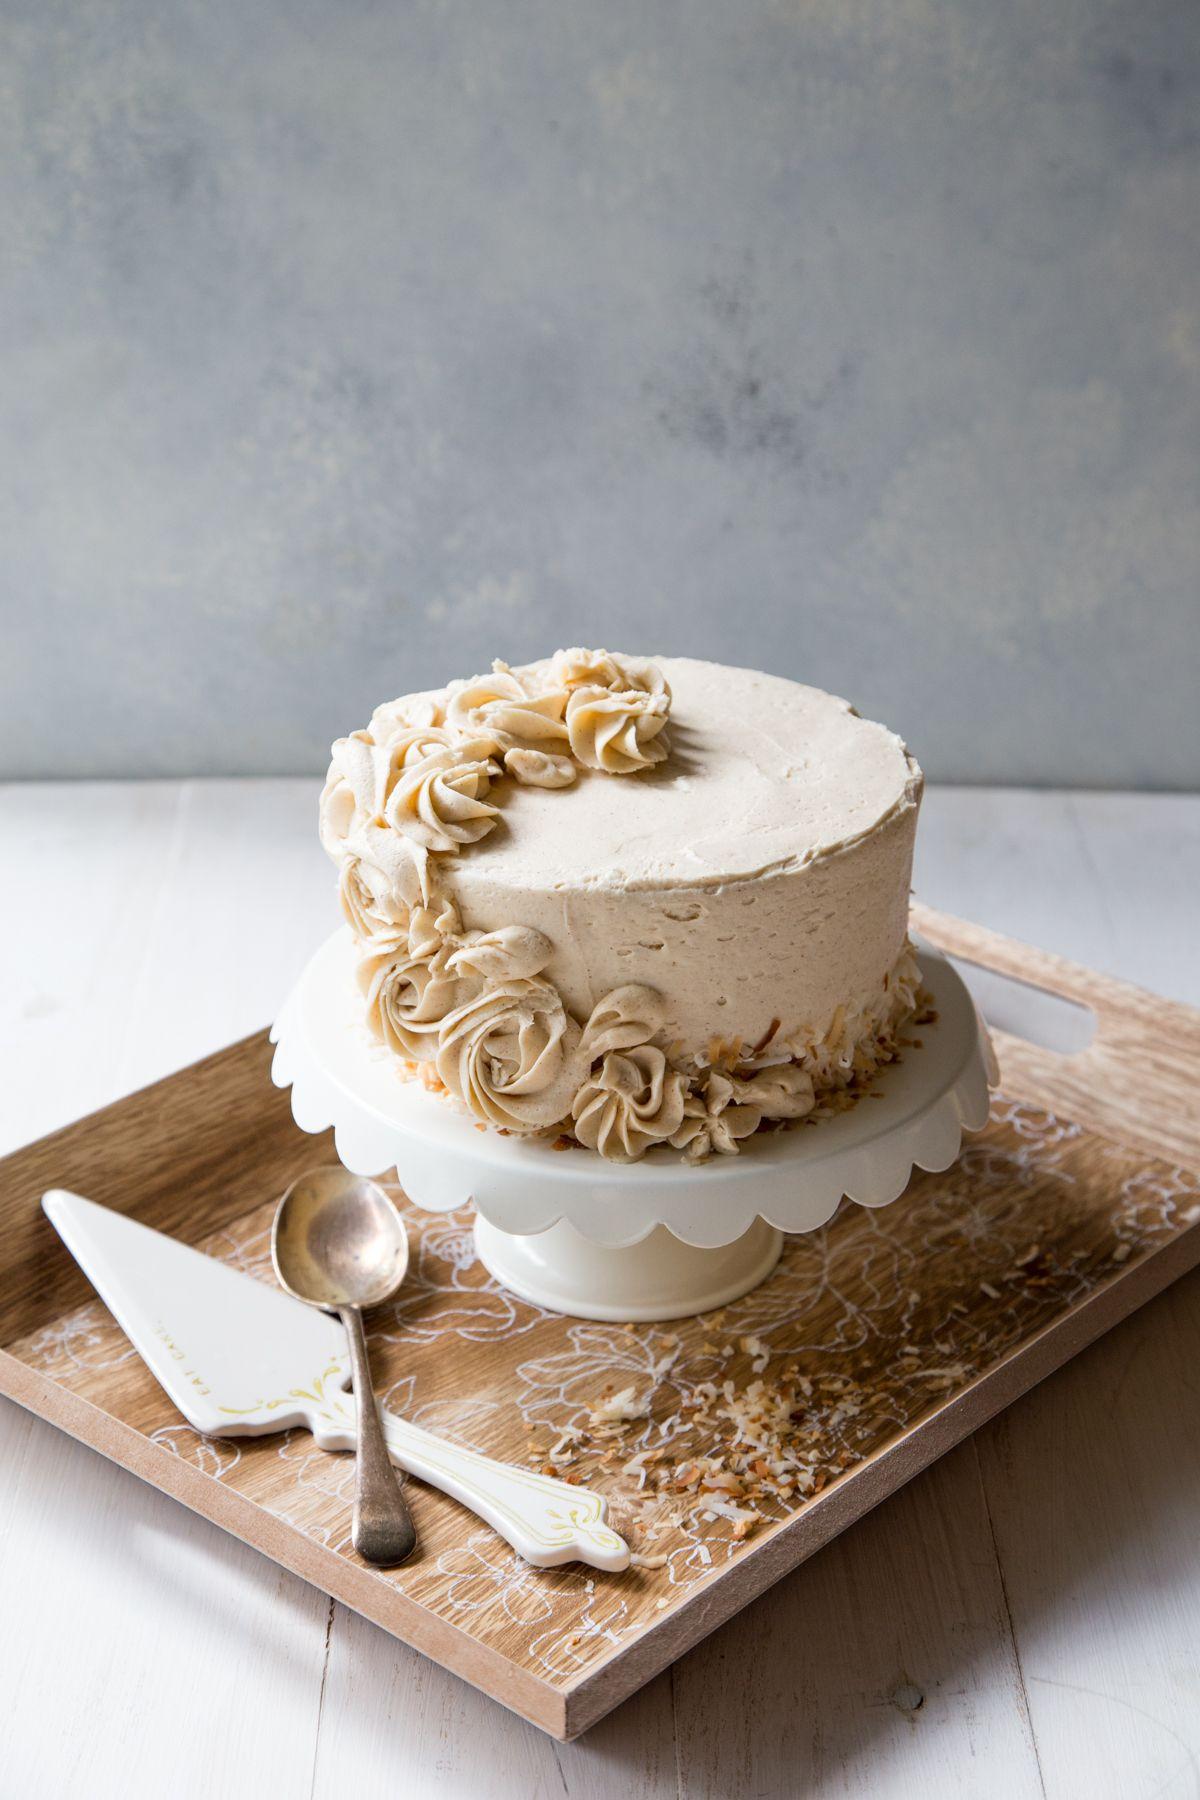 Sensational Banana Cake With Cinnamon Brown Sugar Buttercream Recipe Funny Birthday Cards Online Elaedamsfinfo